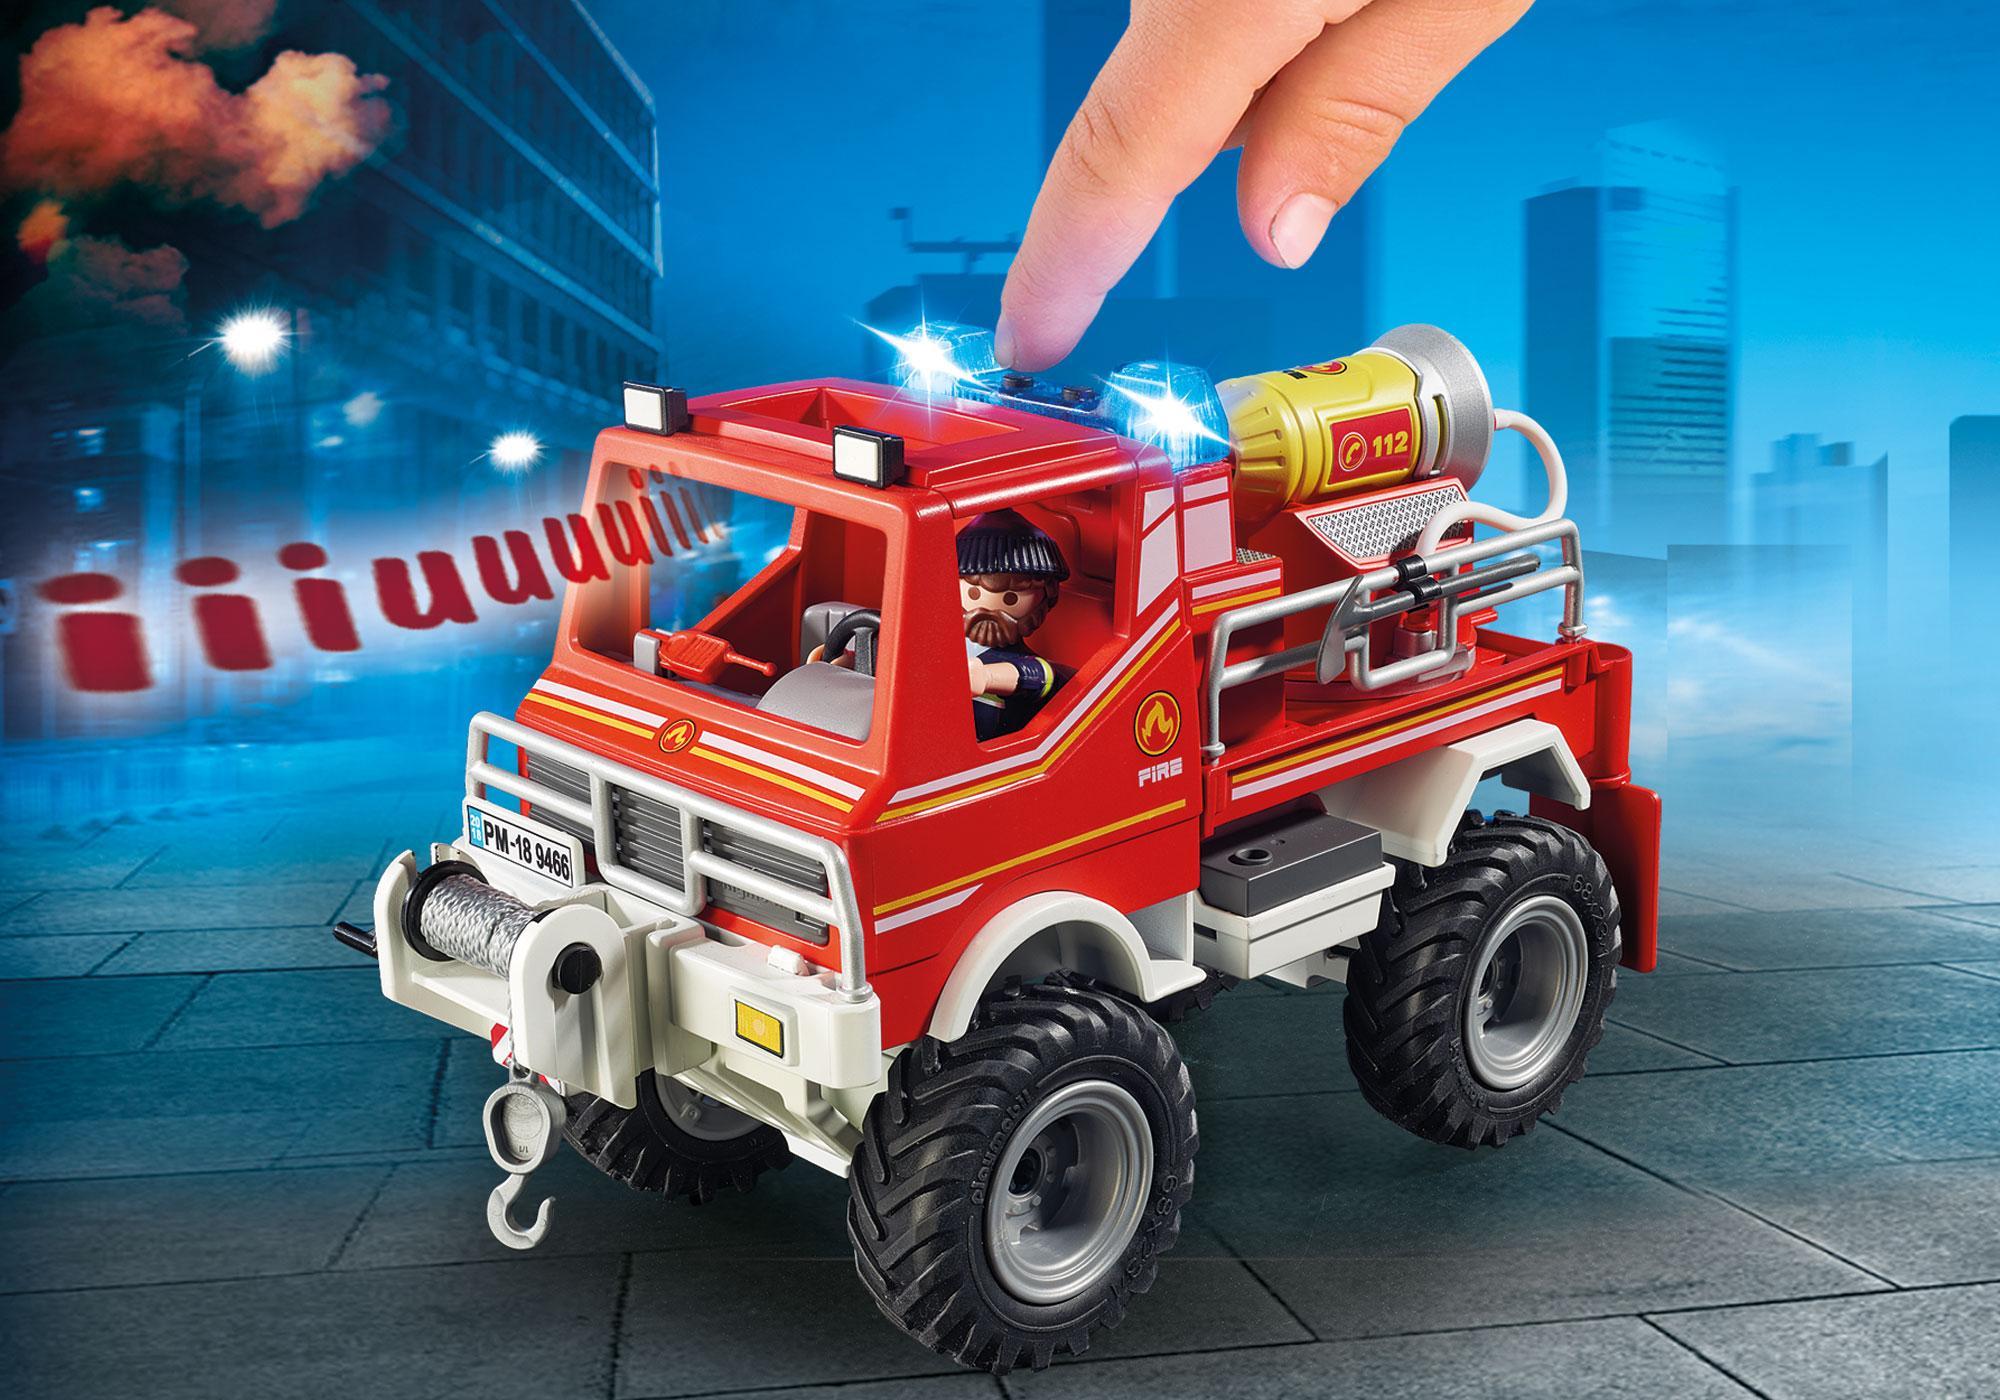 http://media.playmobil.com/i/playmobil/9466_product_extra2/4x4 de pompier avec lance-eau